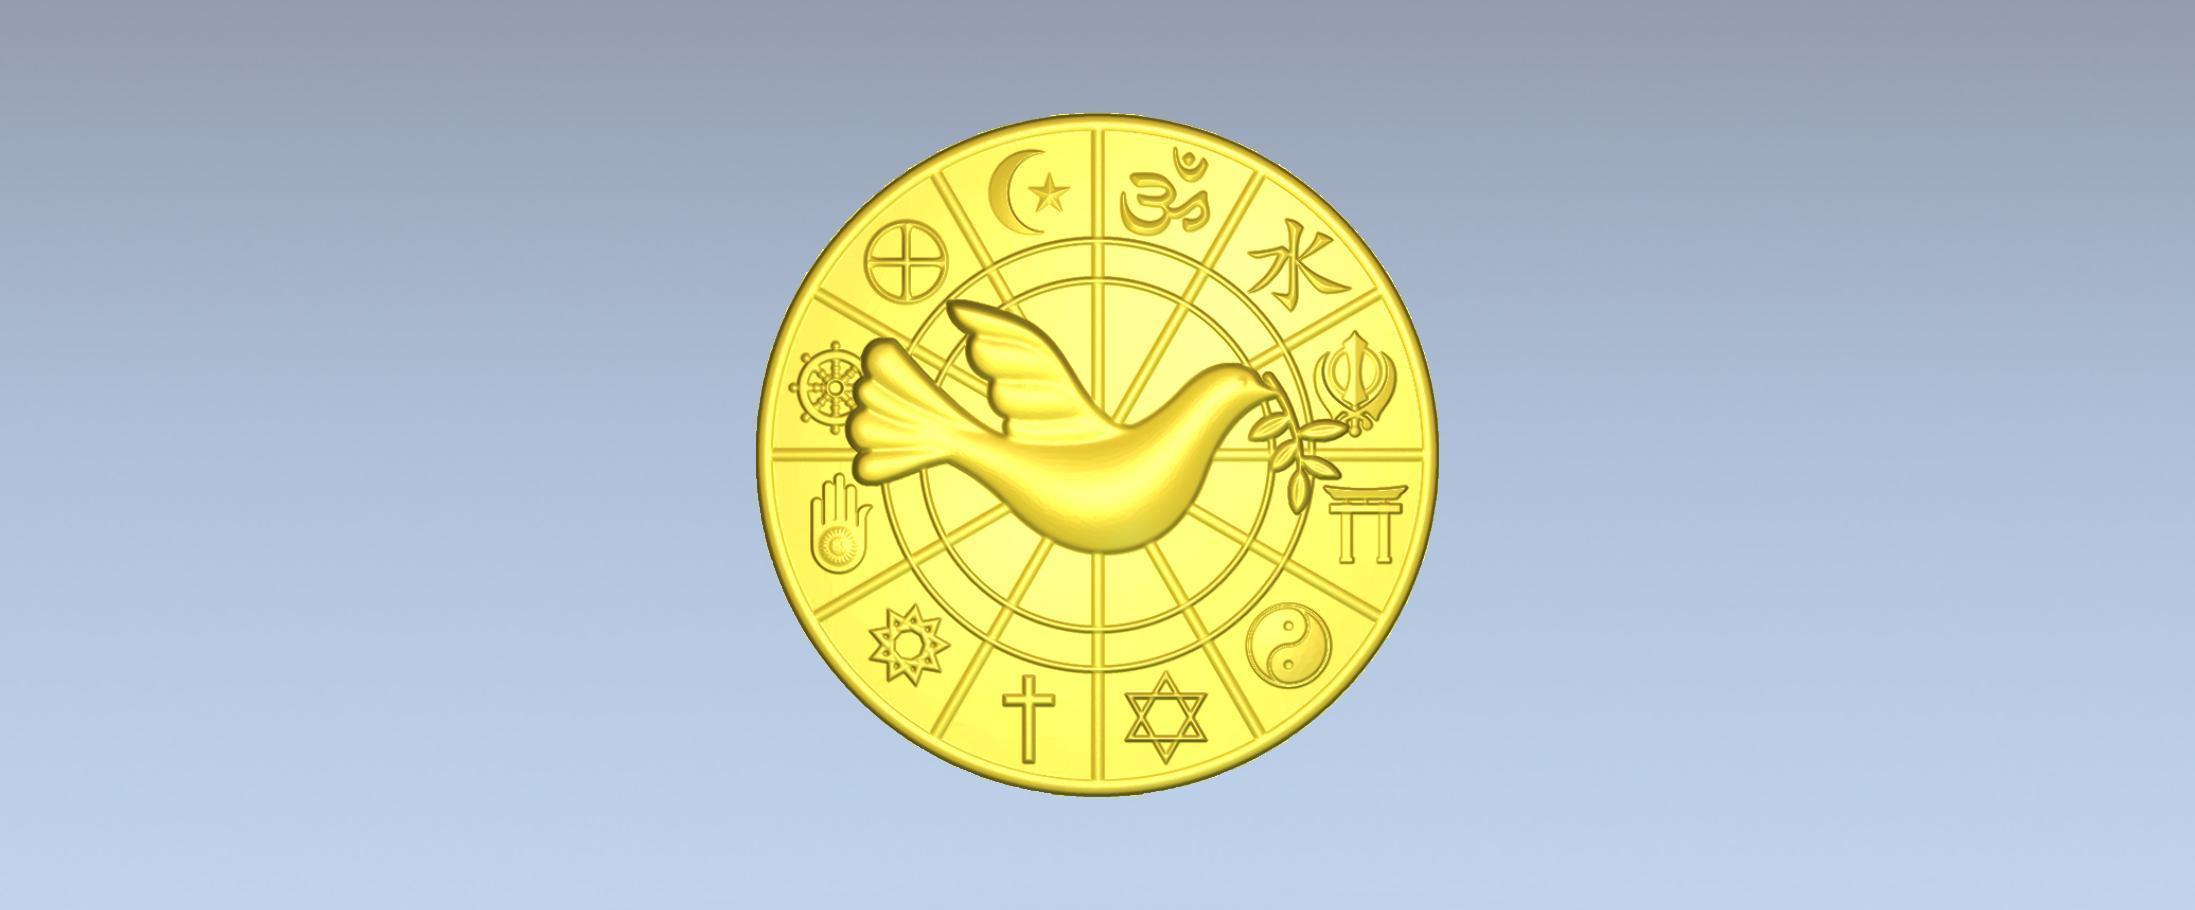 1.jpg Download free STL file 3D STL MODEL WORLD RELIGIOUS • 3D printing model, ALPHA_MENA